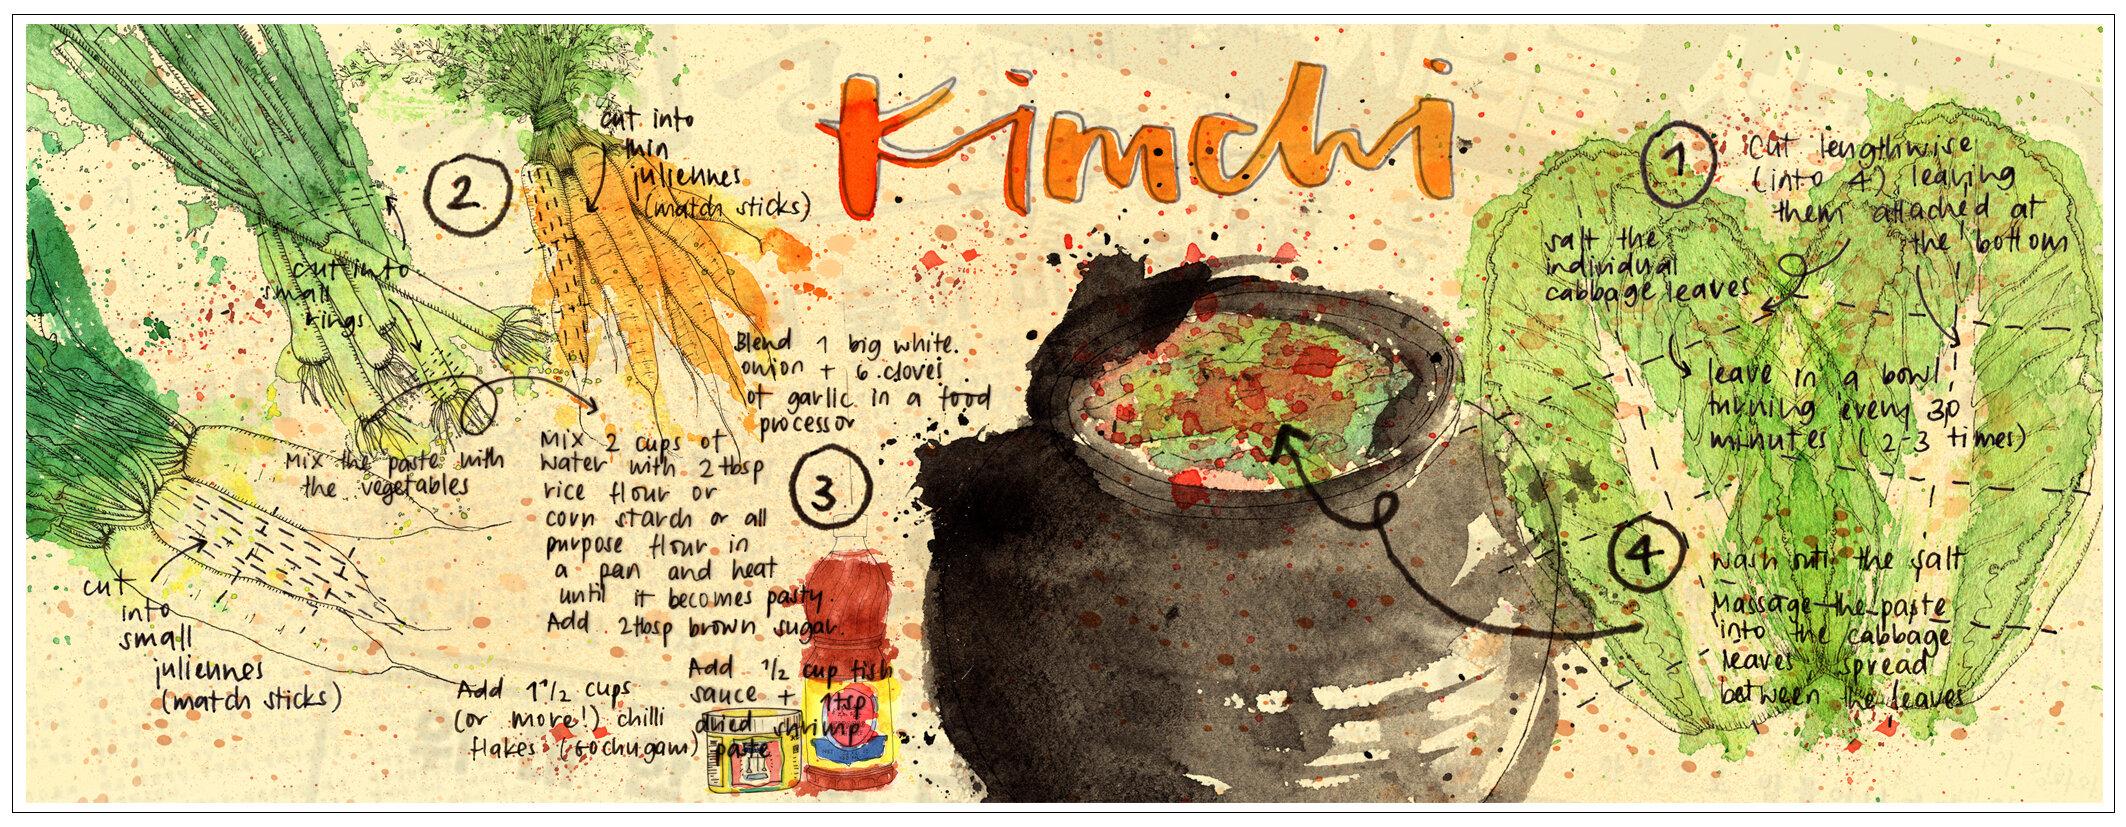 Portfolio_Kimchi recipe.jpg